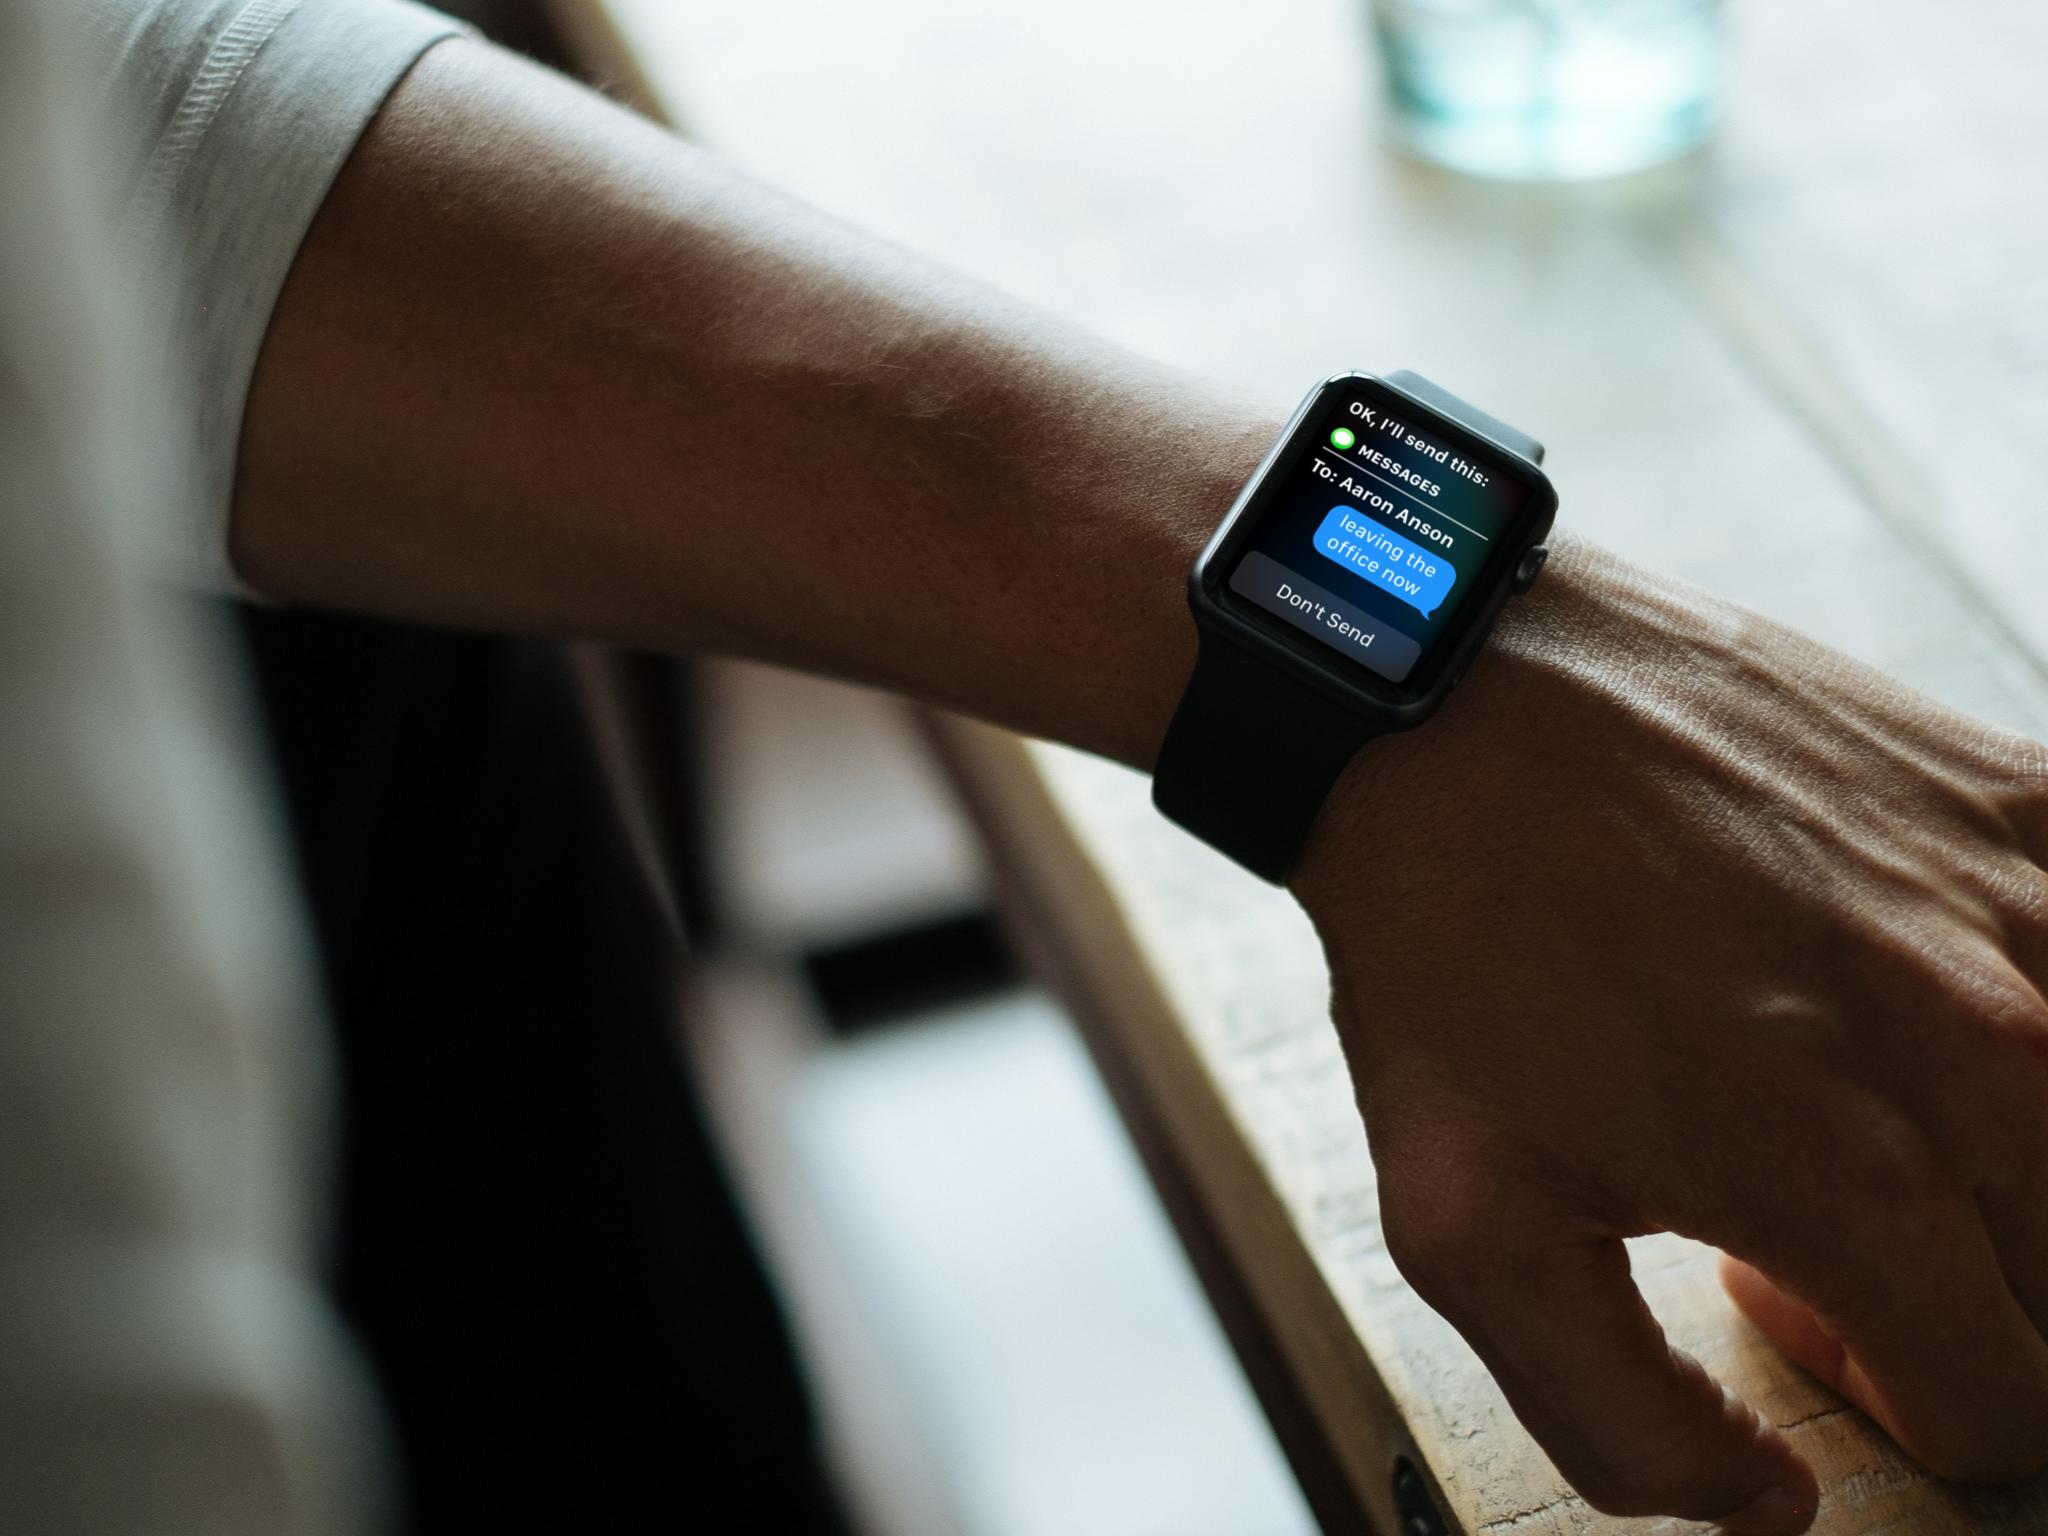 Auto-send on Apple Watch